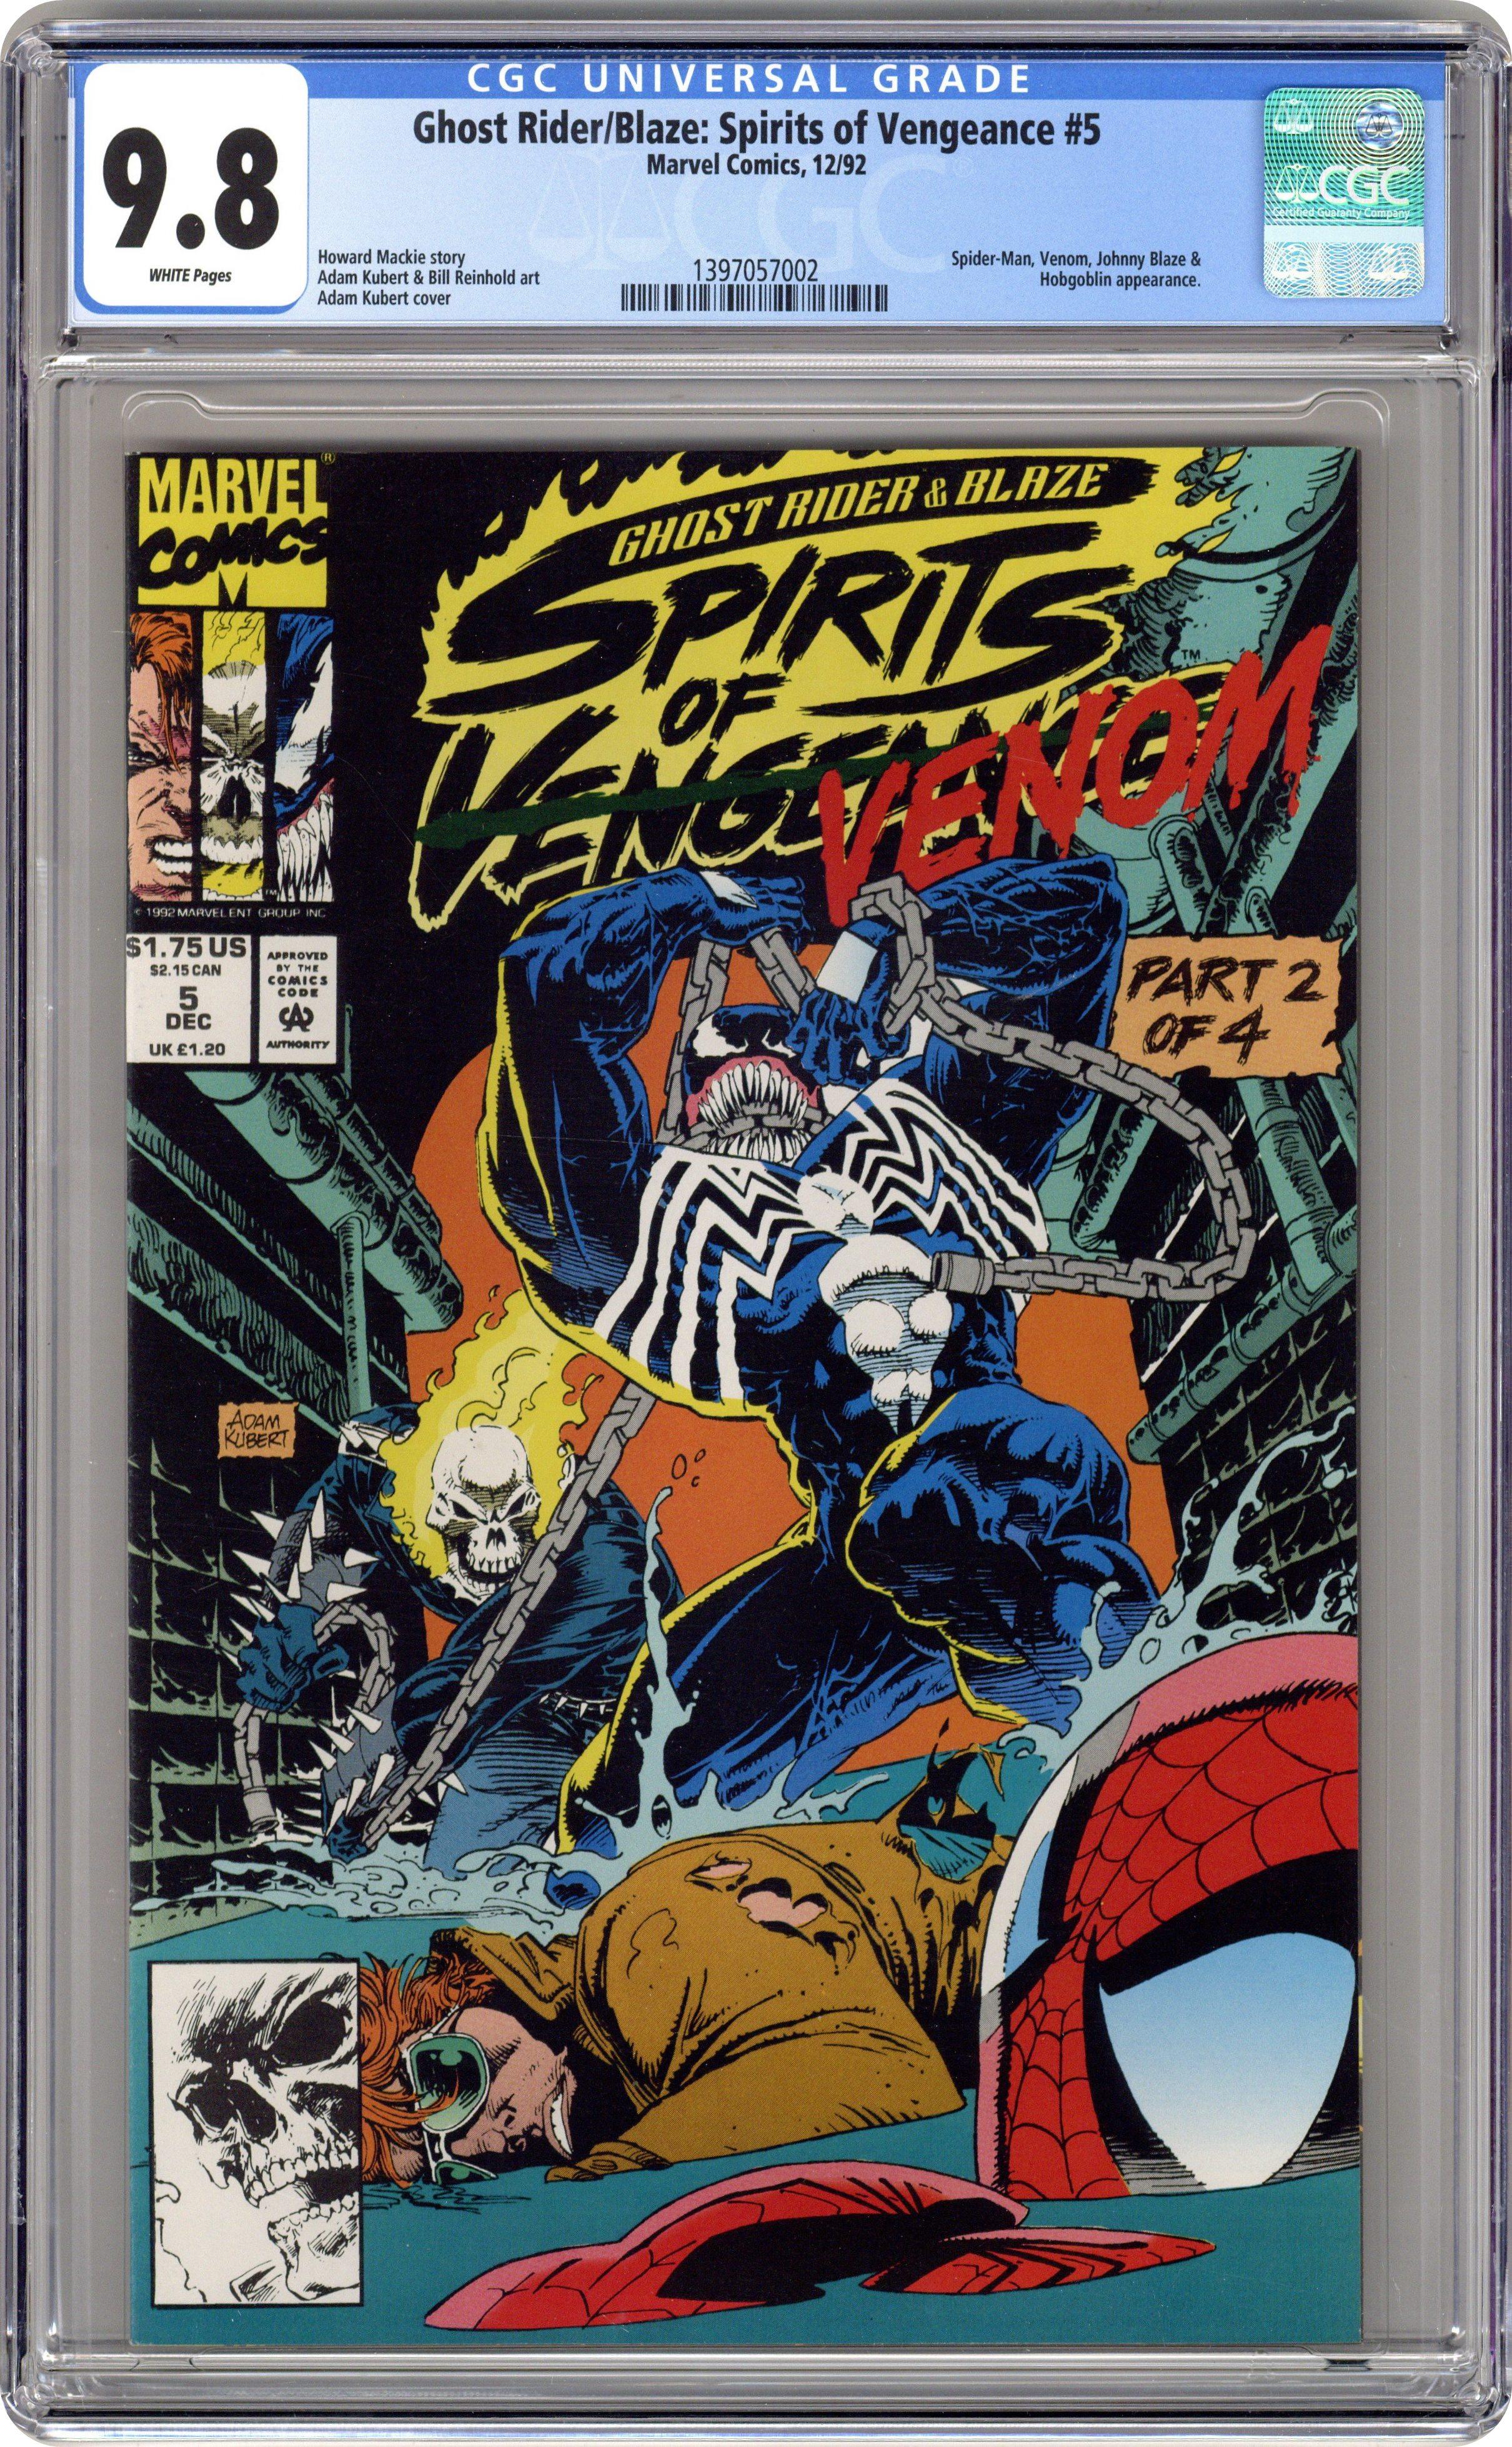 Batman Superman #1 CGC 9.8 Scorpion Comics Edition A Clayton Crain Cover Variant